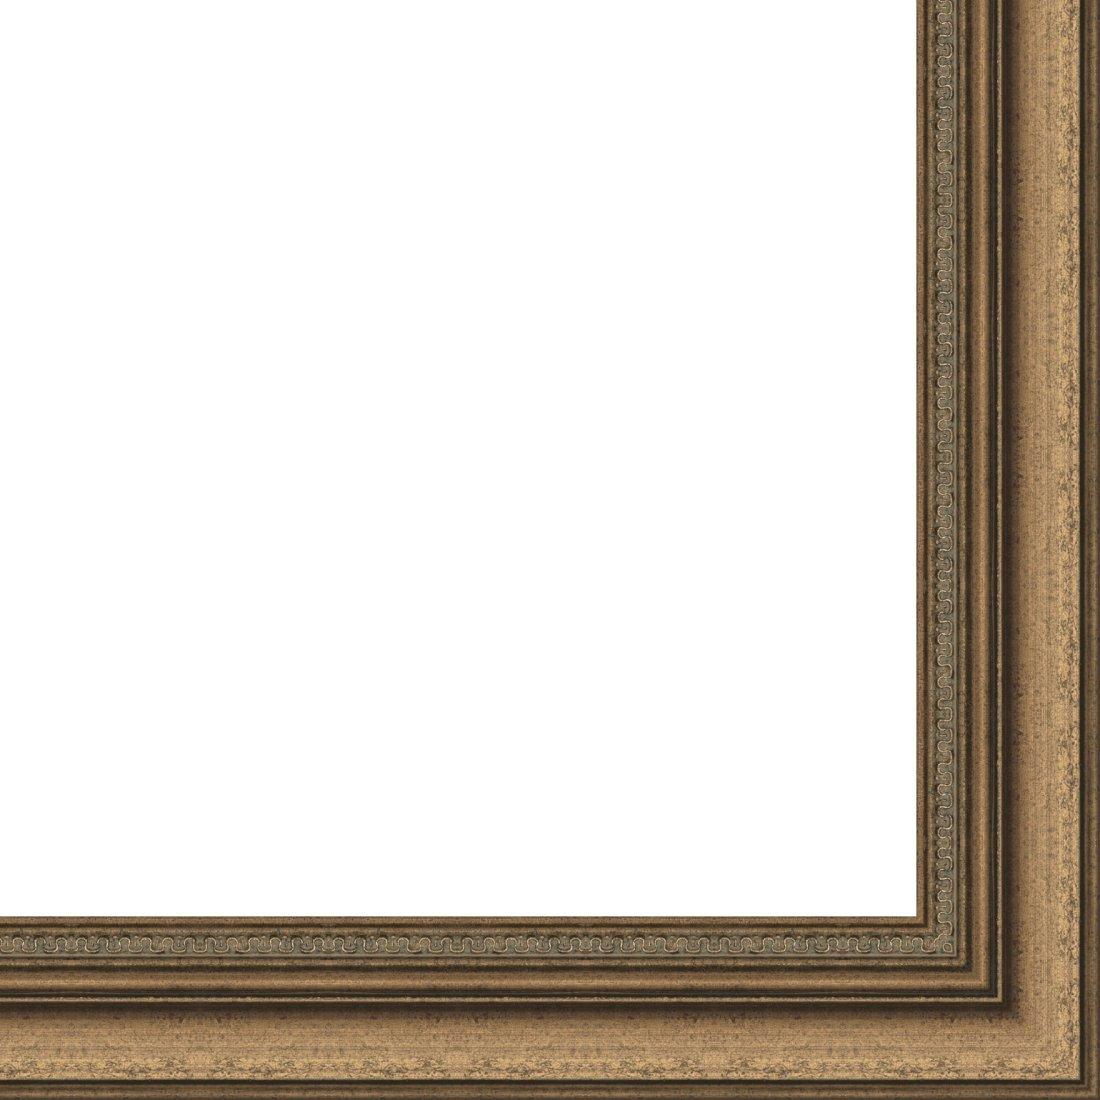 Picture Frame Moulding (Wood) 18ft bundle - Traditional Antique Gold Finish - 2'' width - 11/16'' rabbet depth